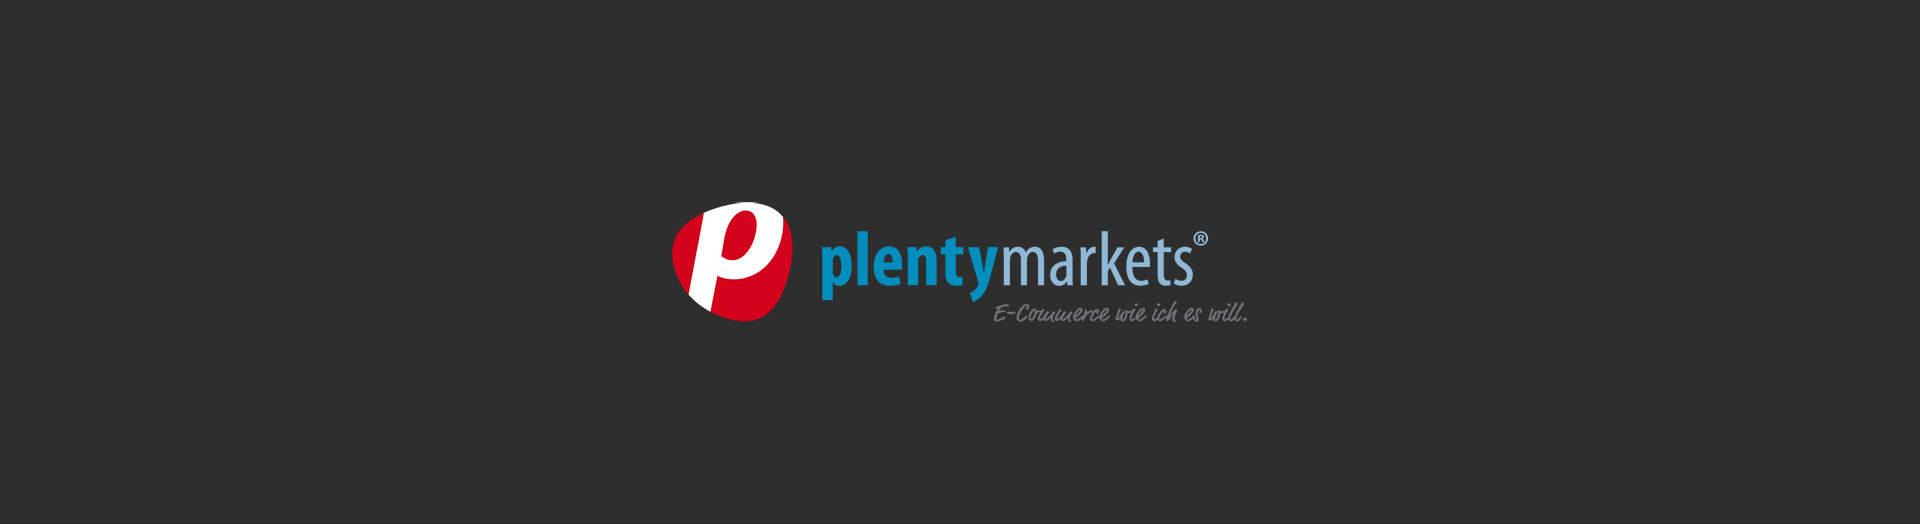 Plentymarkets E-Commerce services